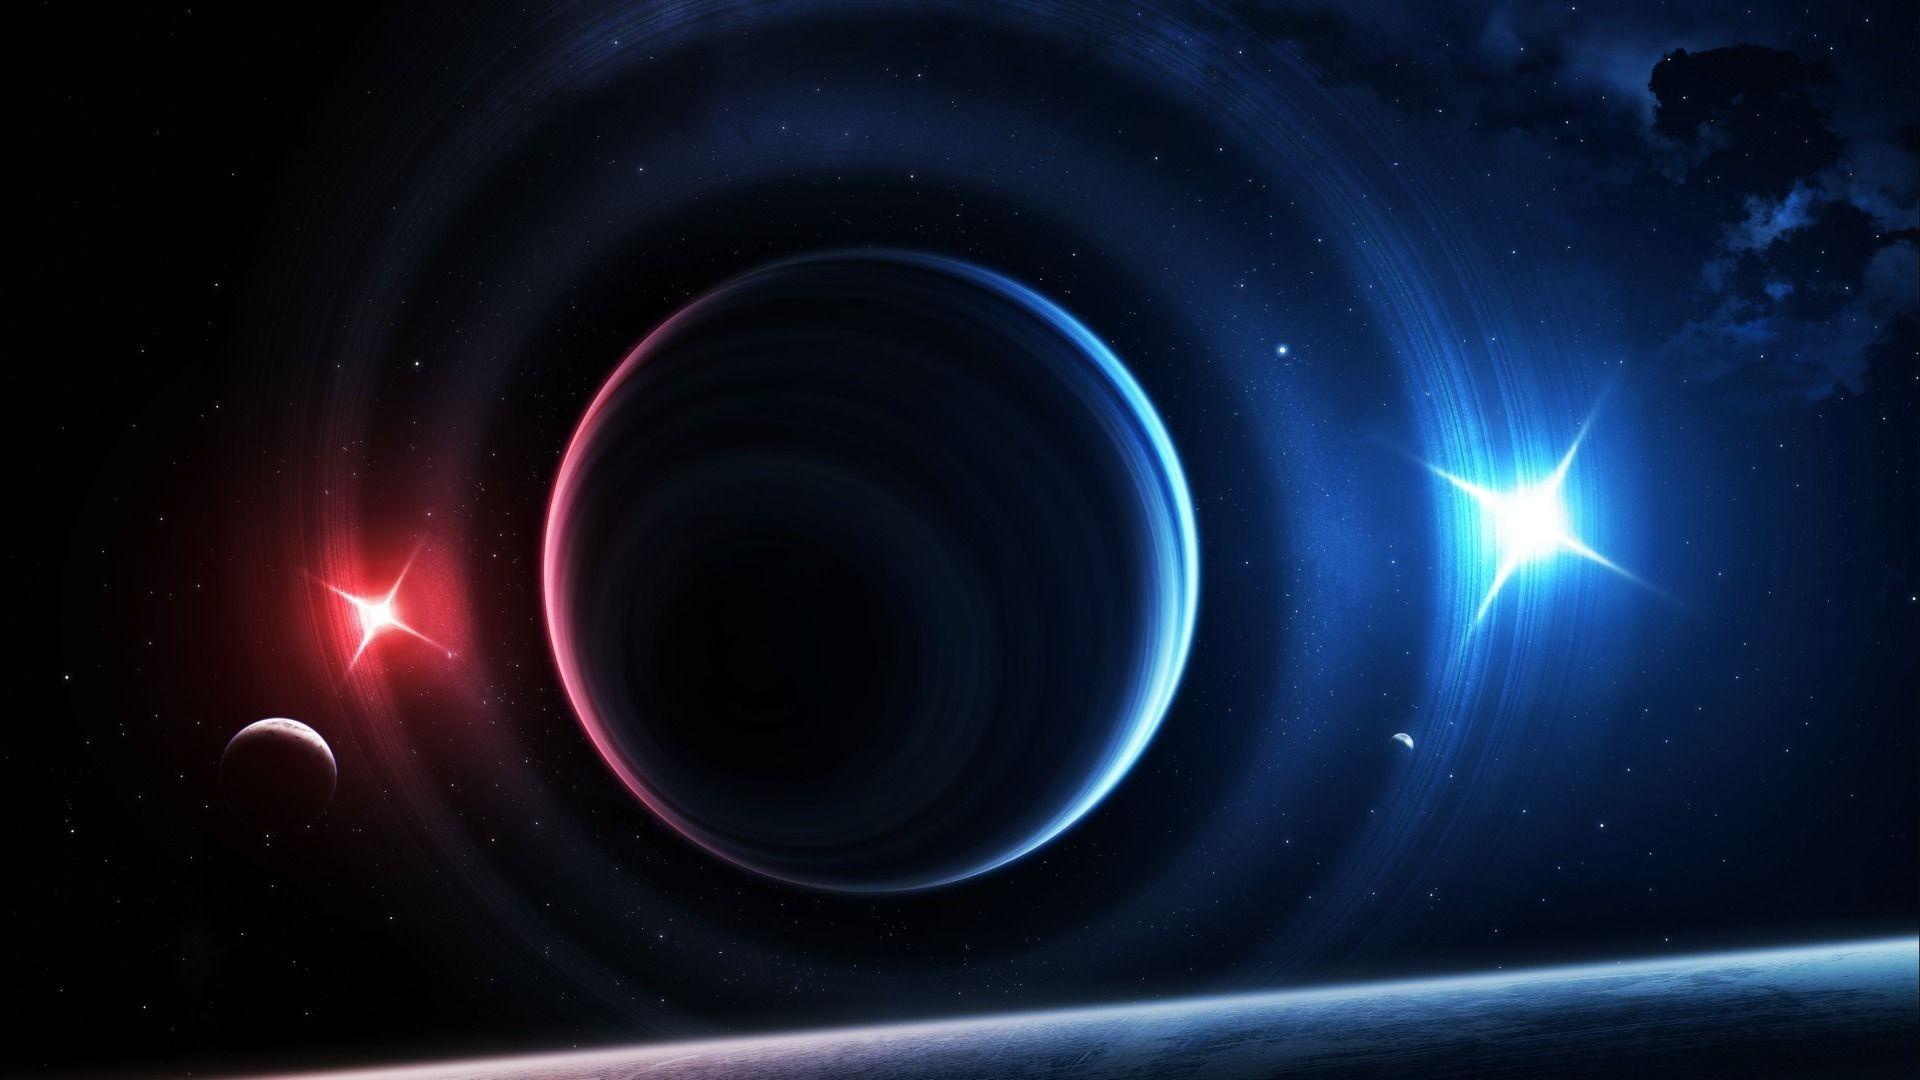 Download Wallpaper 2780x2780 Planet Galaxy Universe: 3D Universe Wallpaper (59+ Images